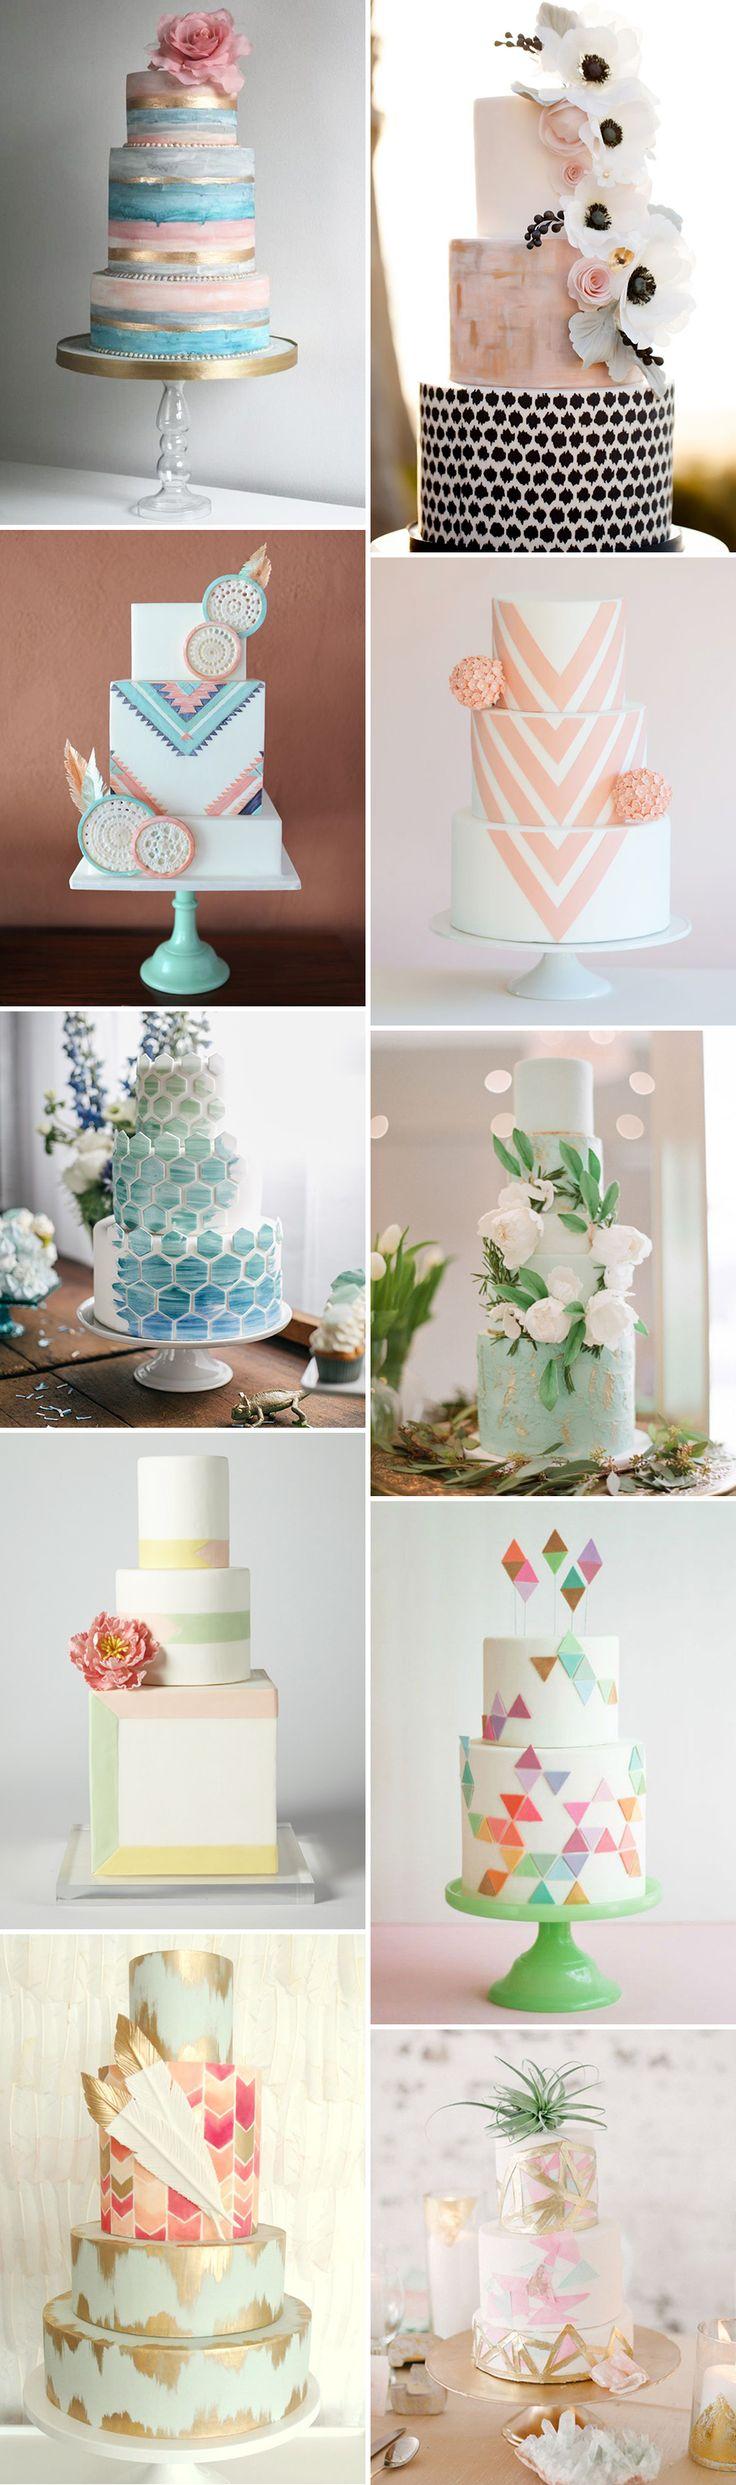 modern pastel wedding cakes I best day ever creative events blog I #bdeblog